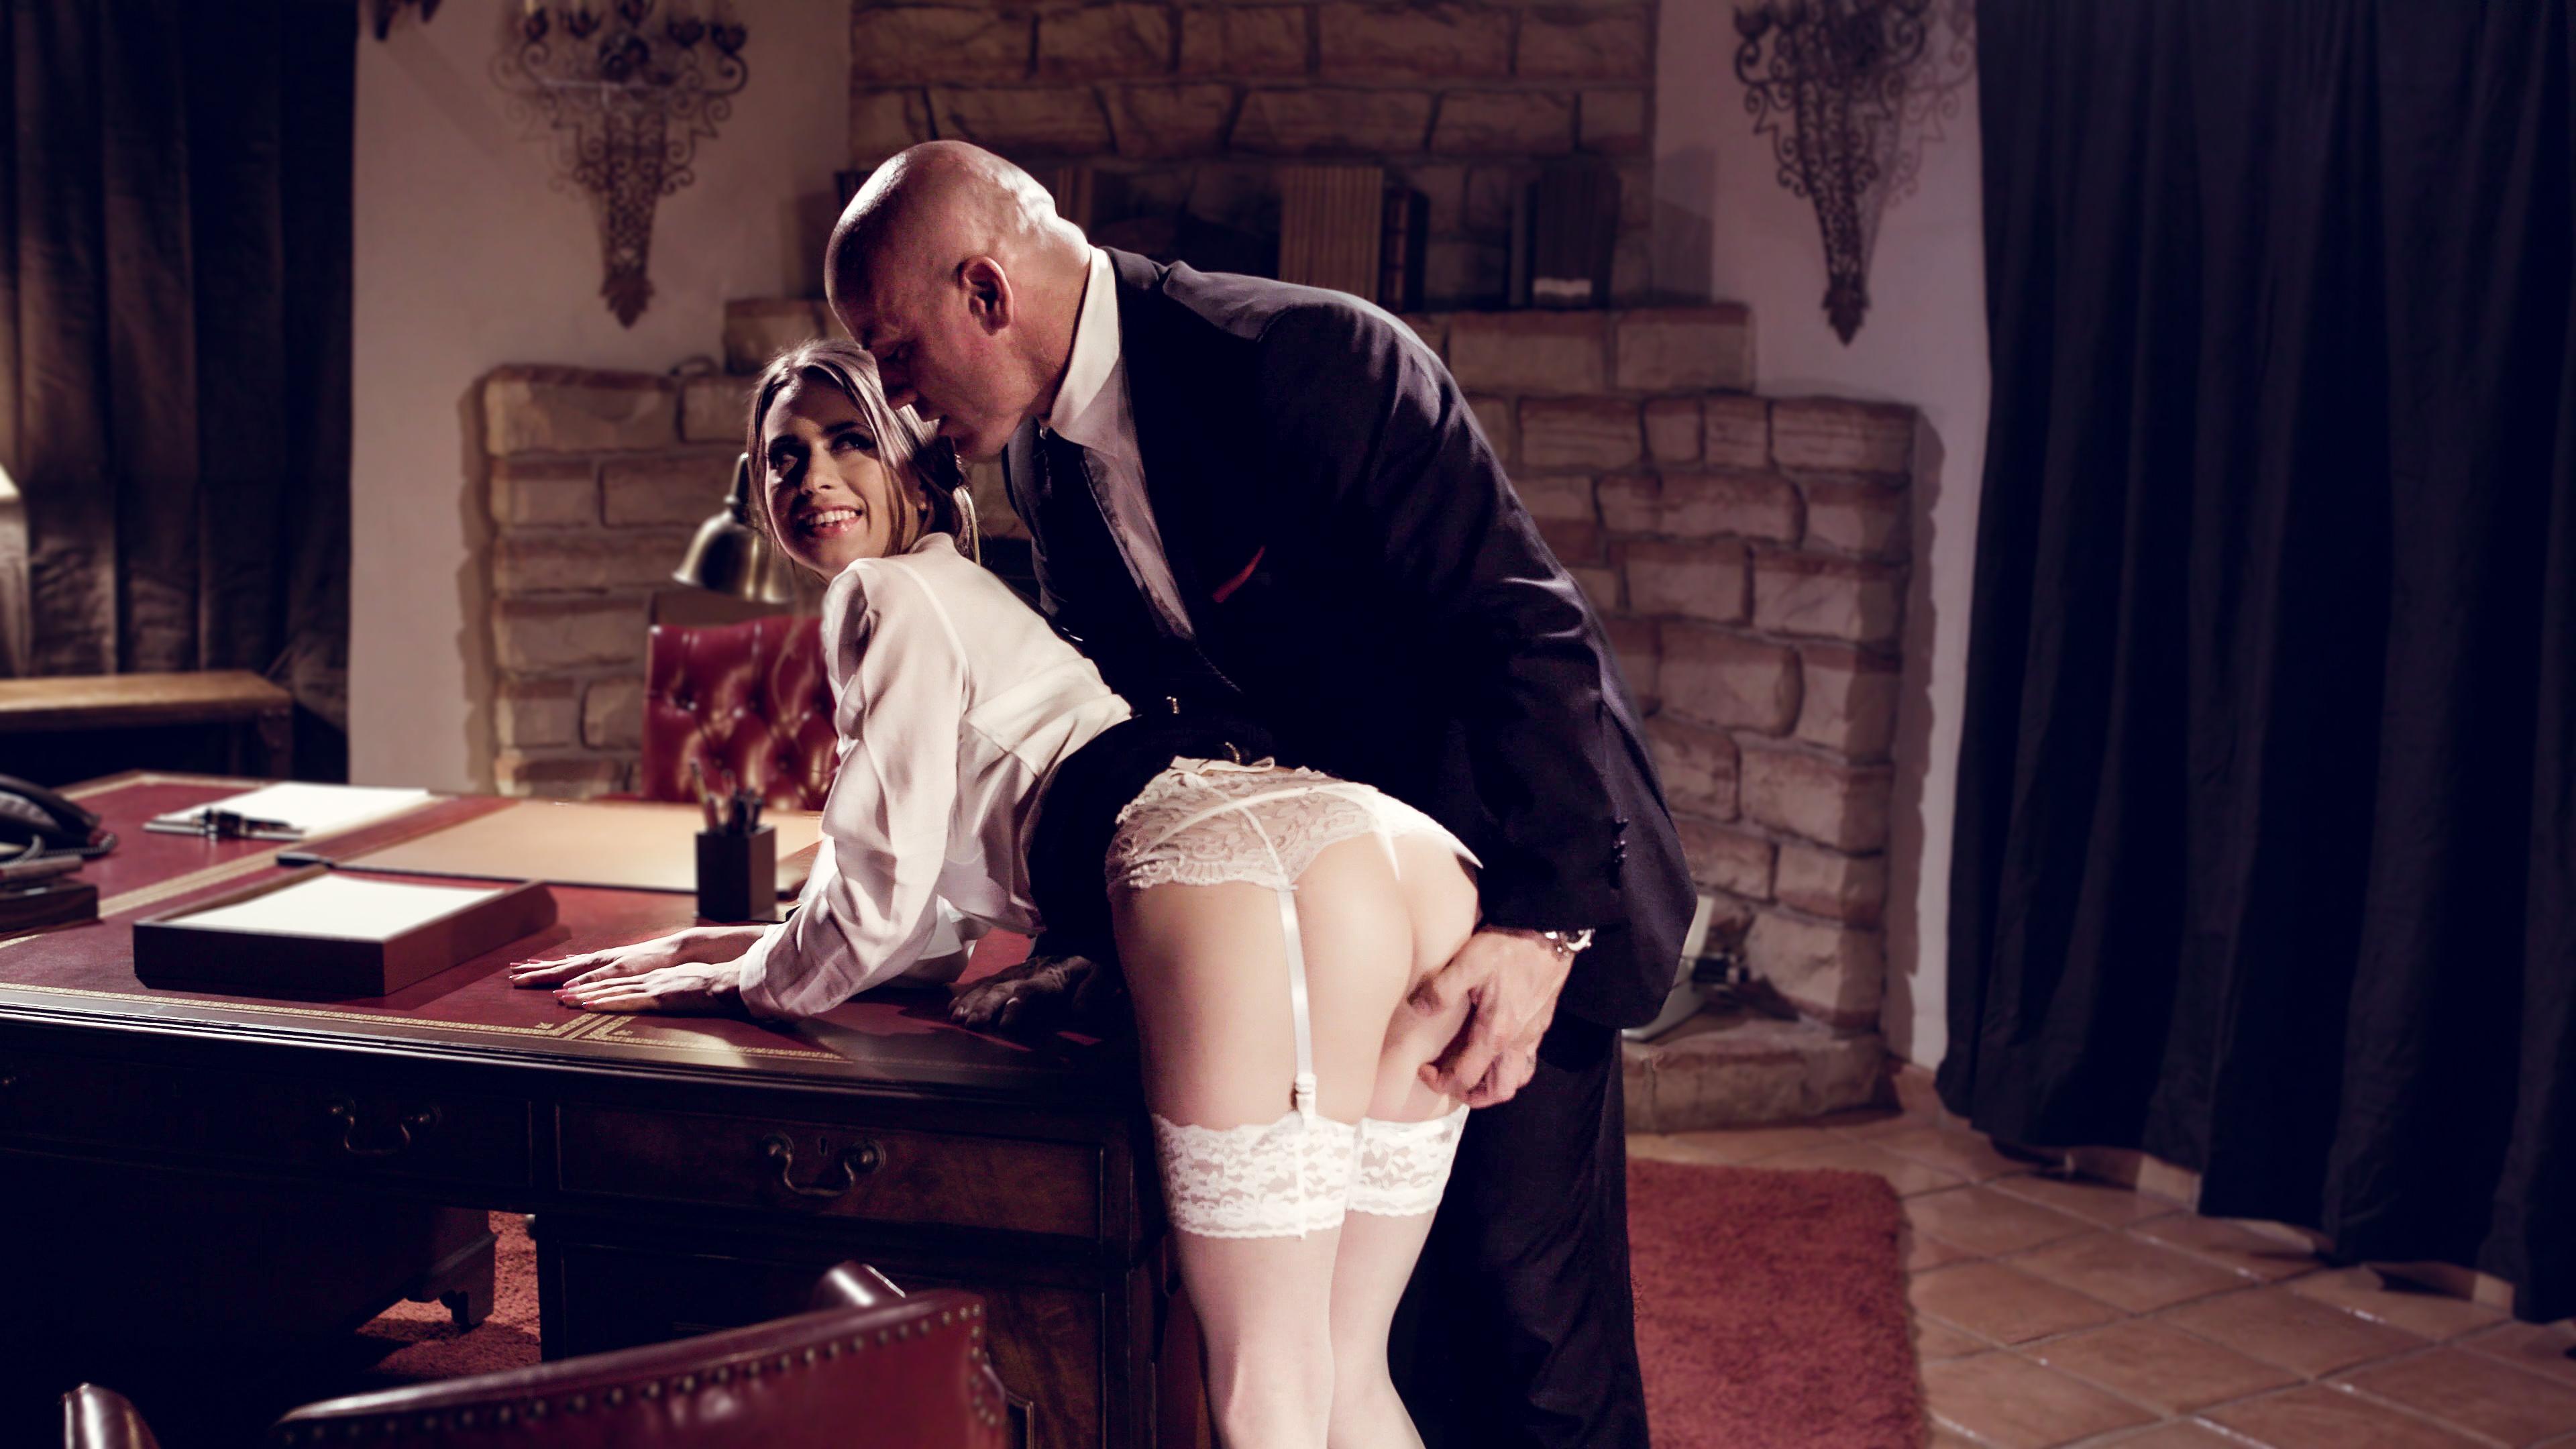 Angela white free webcam porn video masturbation sex XXX